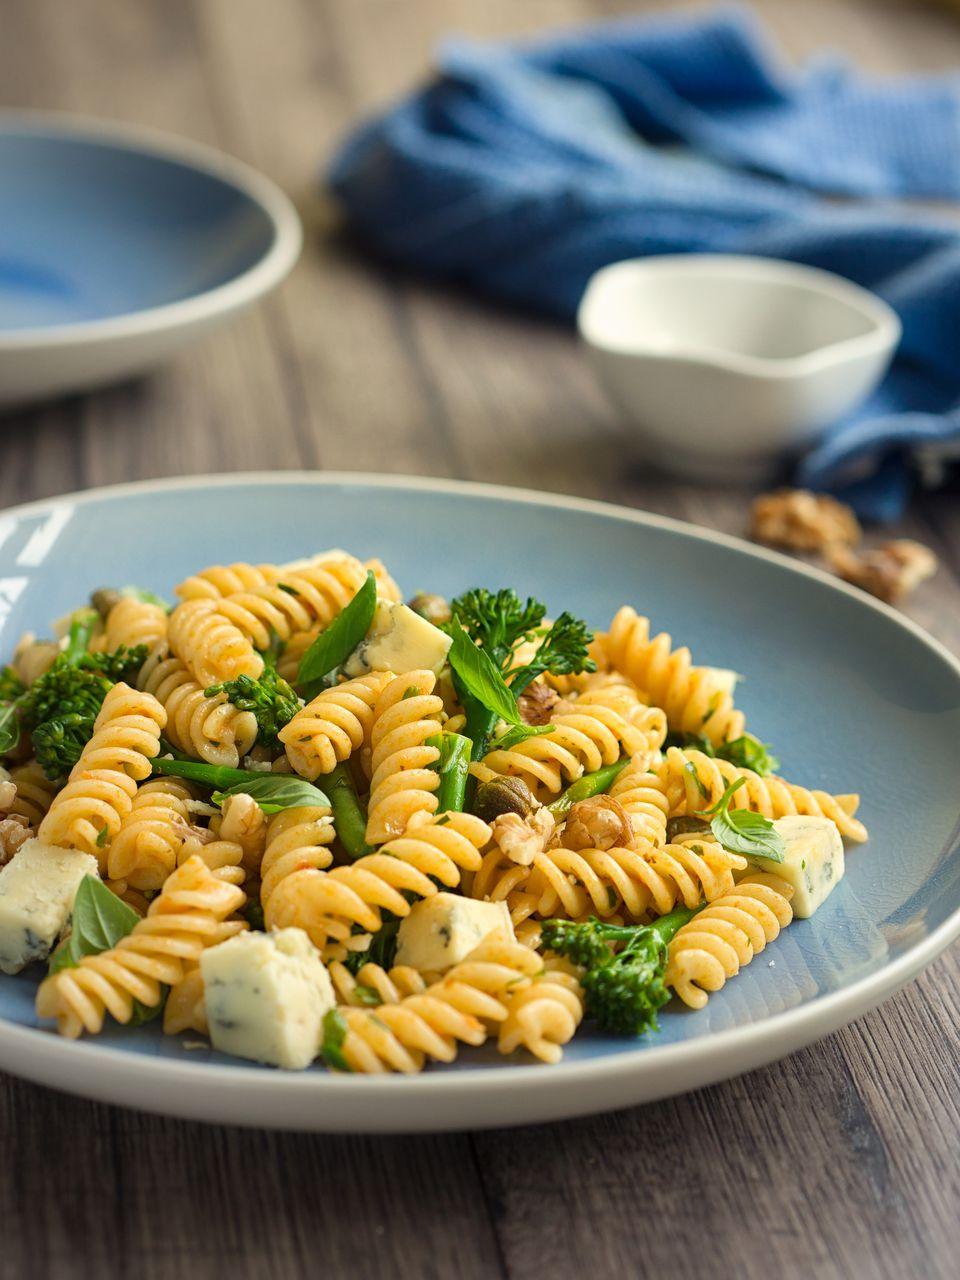 Broccoli and walnut pasta